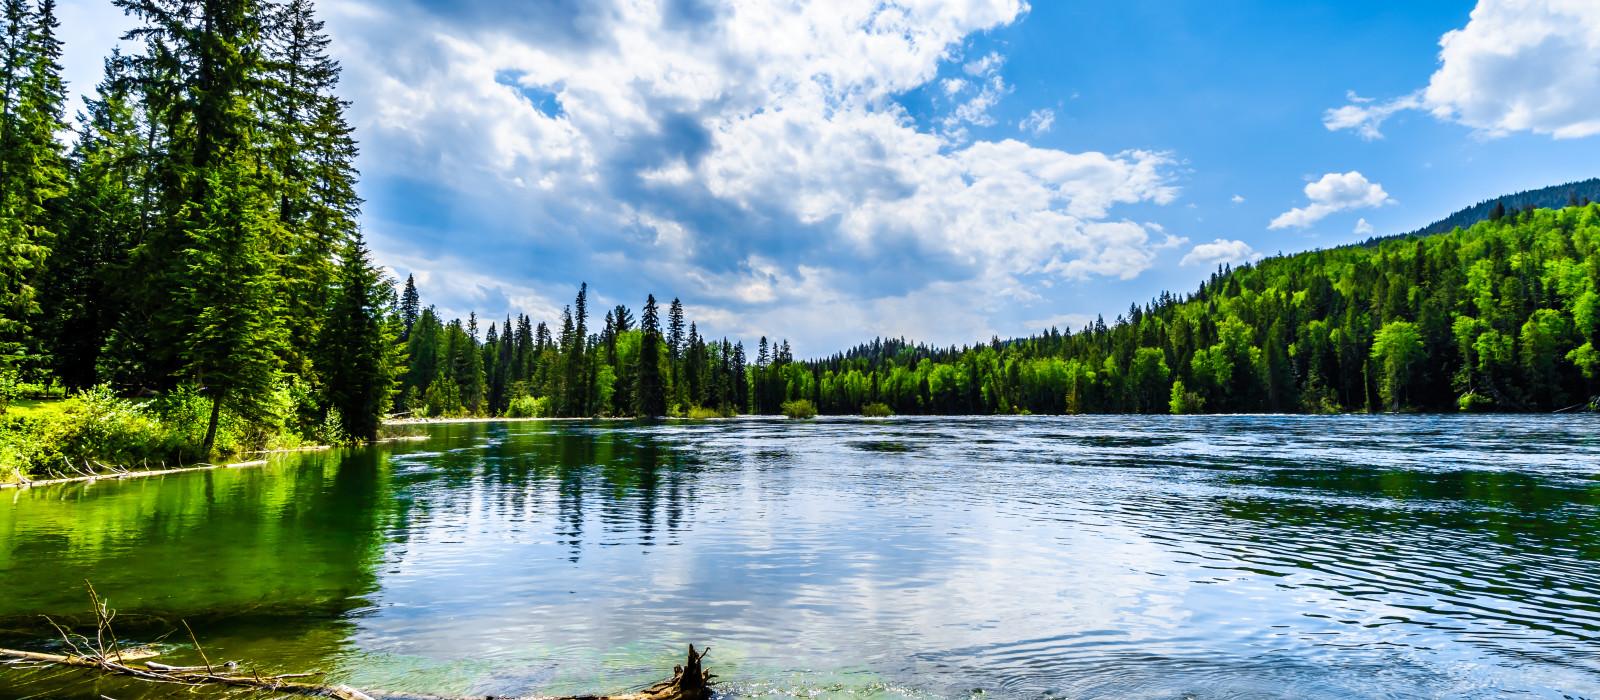 Reiseziel Clearwater Kanada